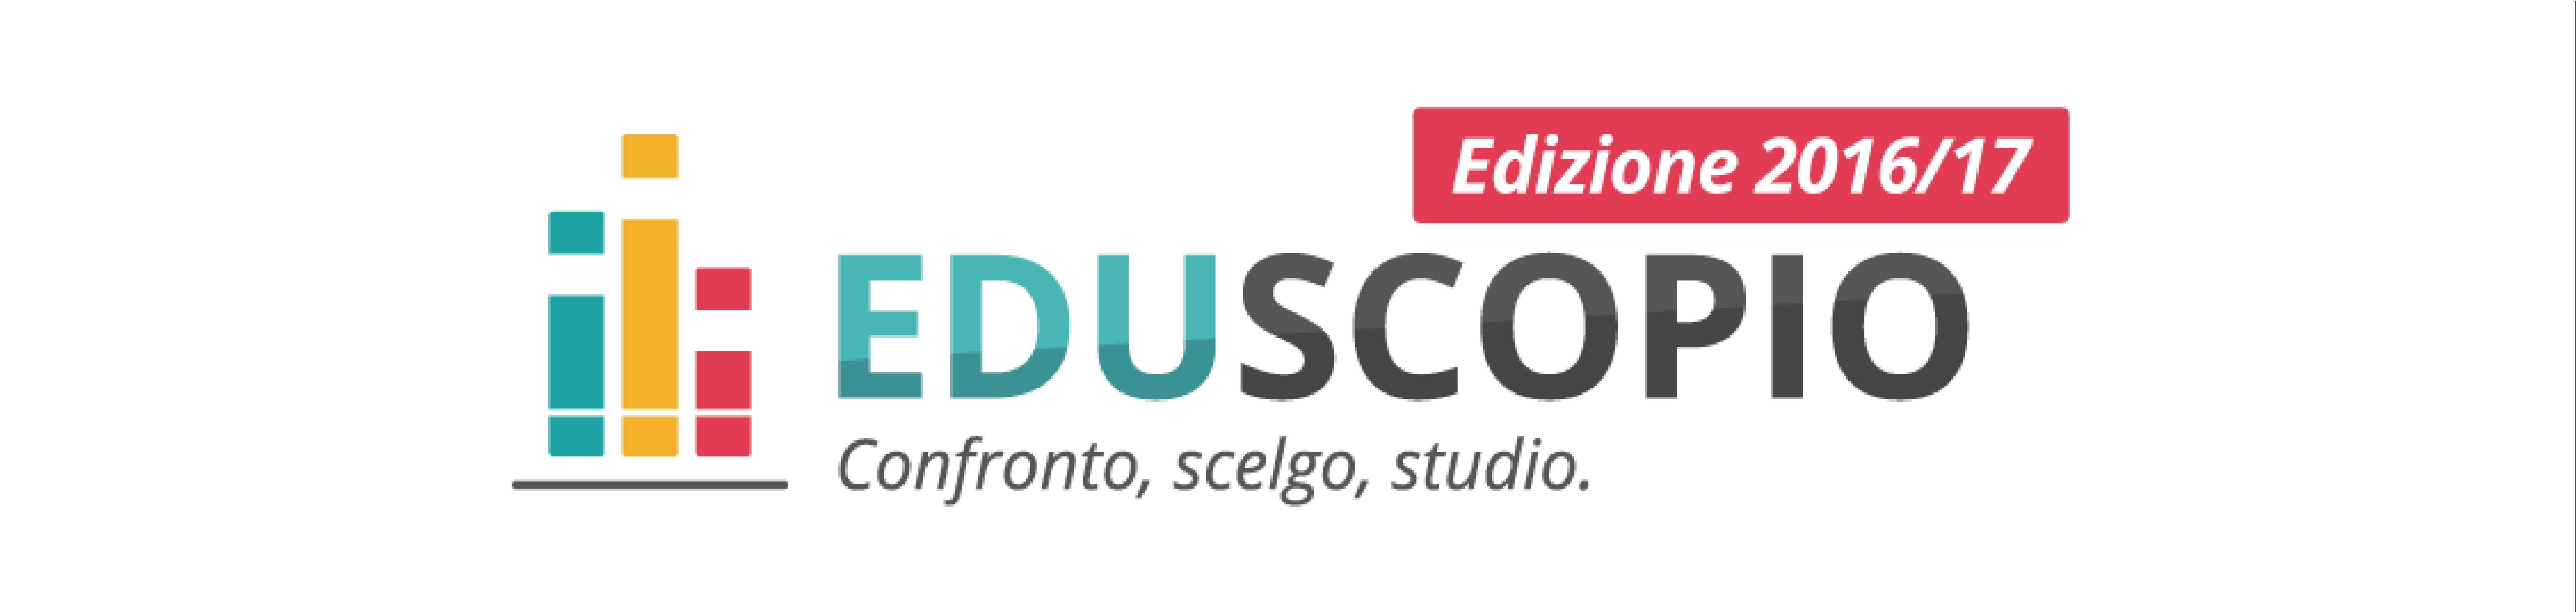 Eduscopio 2016-2017 online